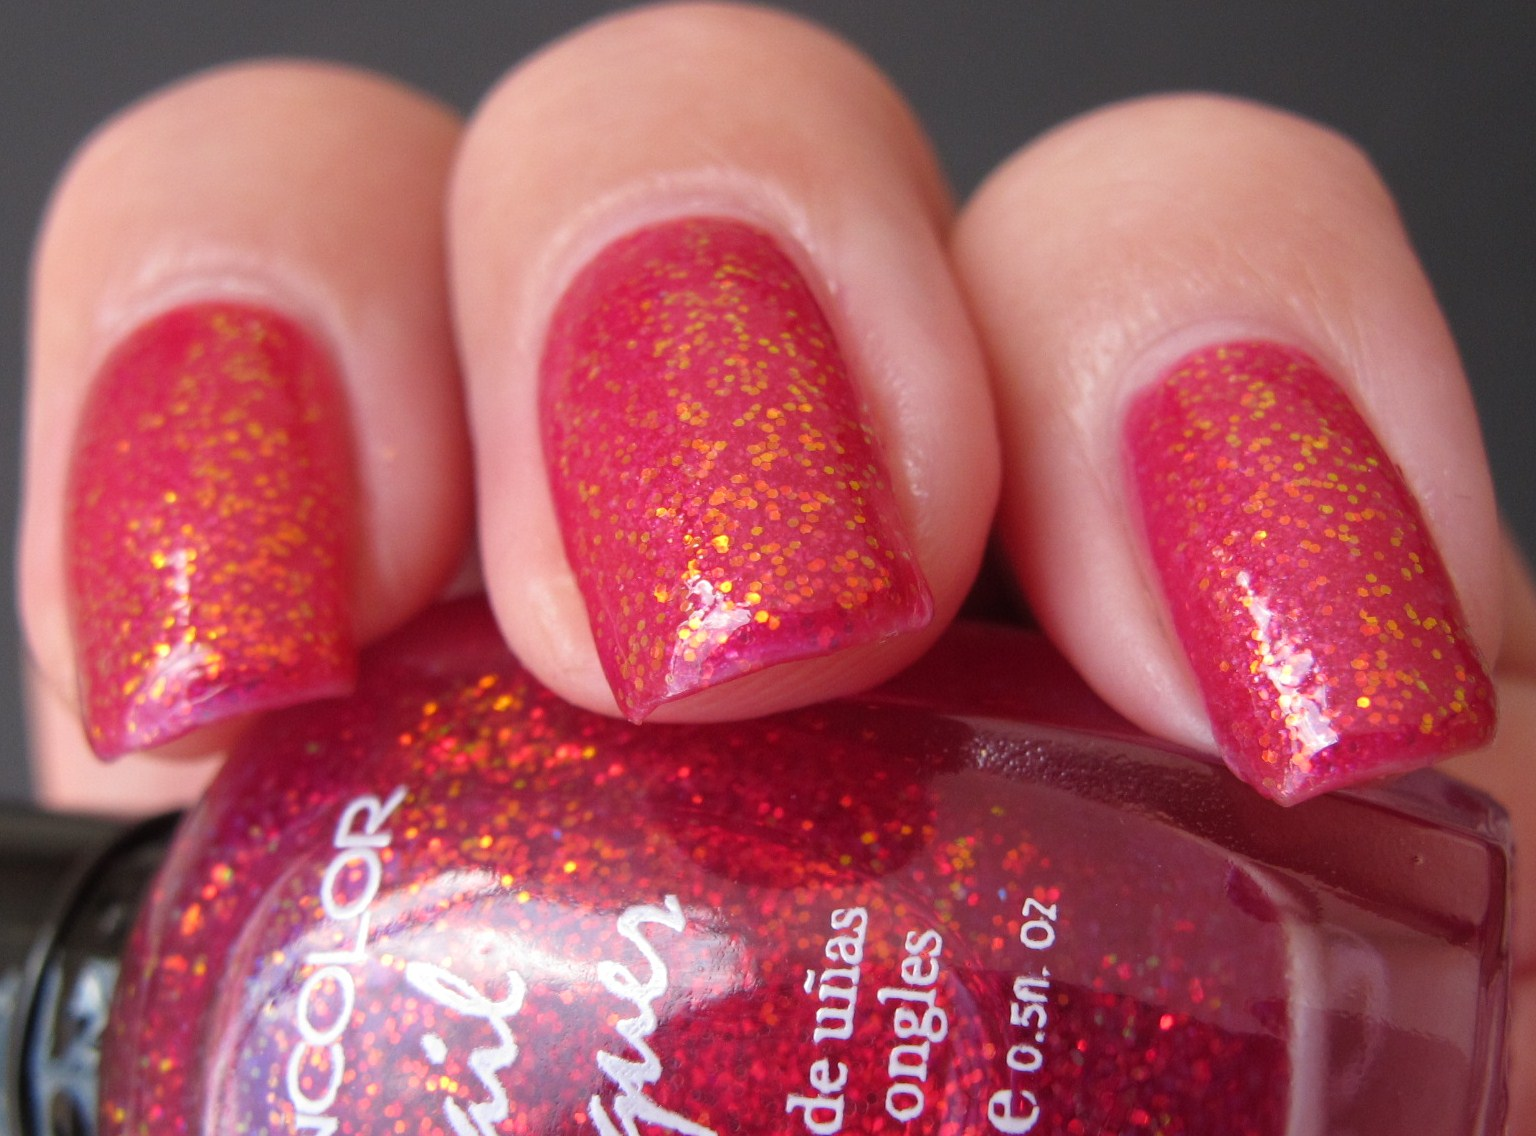 Zoya Aria & Kleancolor Chunky Holo Fuchsia - Polish This!